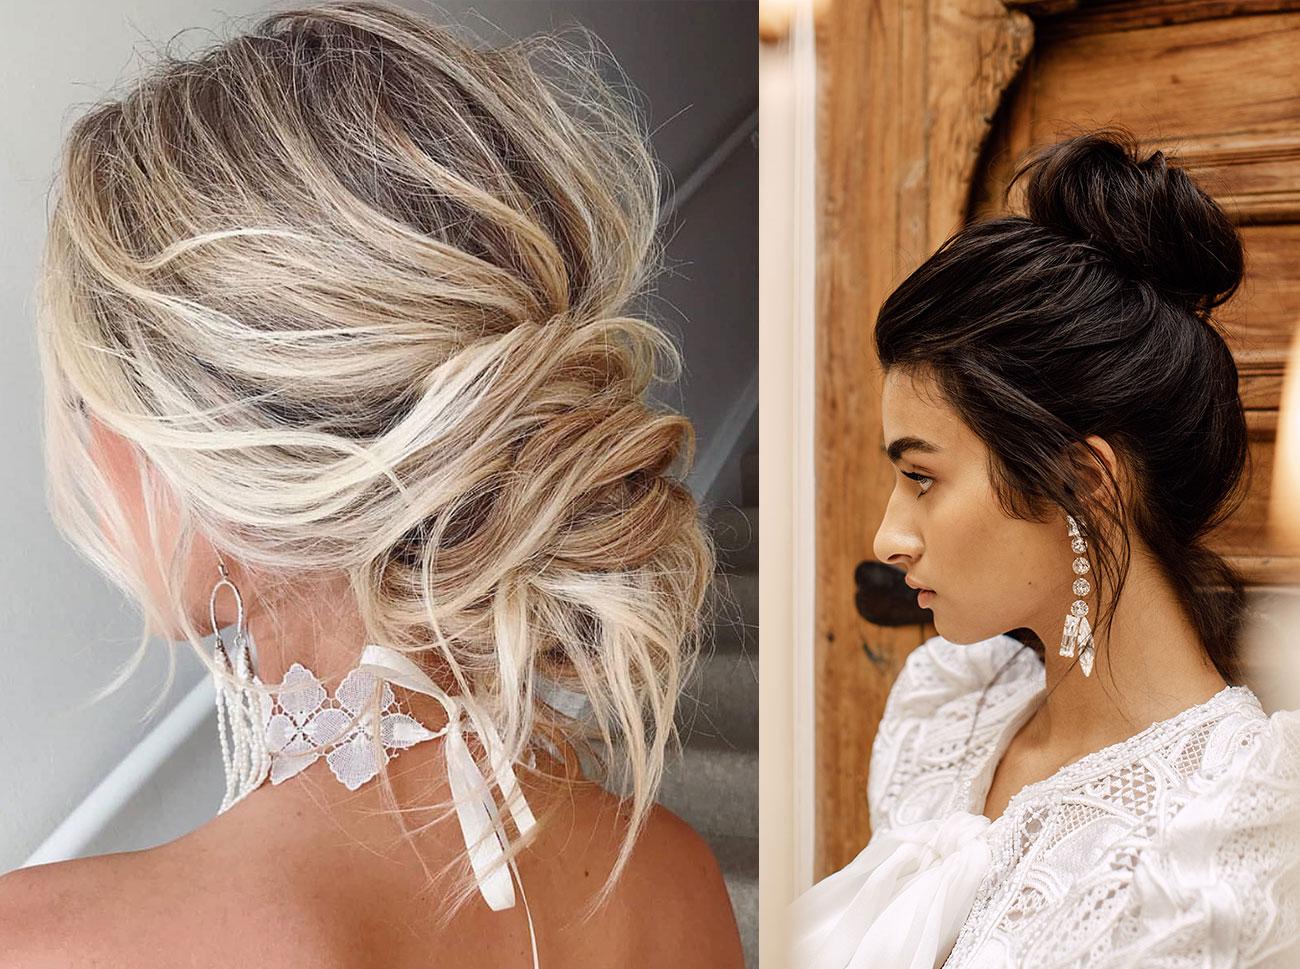 Trending Now Boho Chic Messy Bun Wedding Hairstyles Green